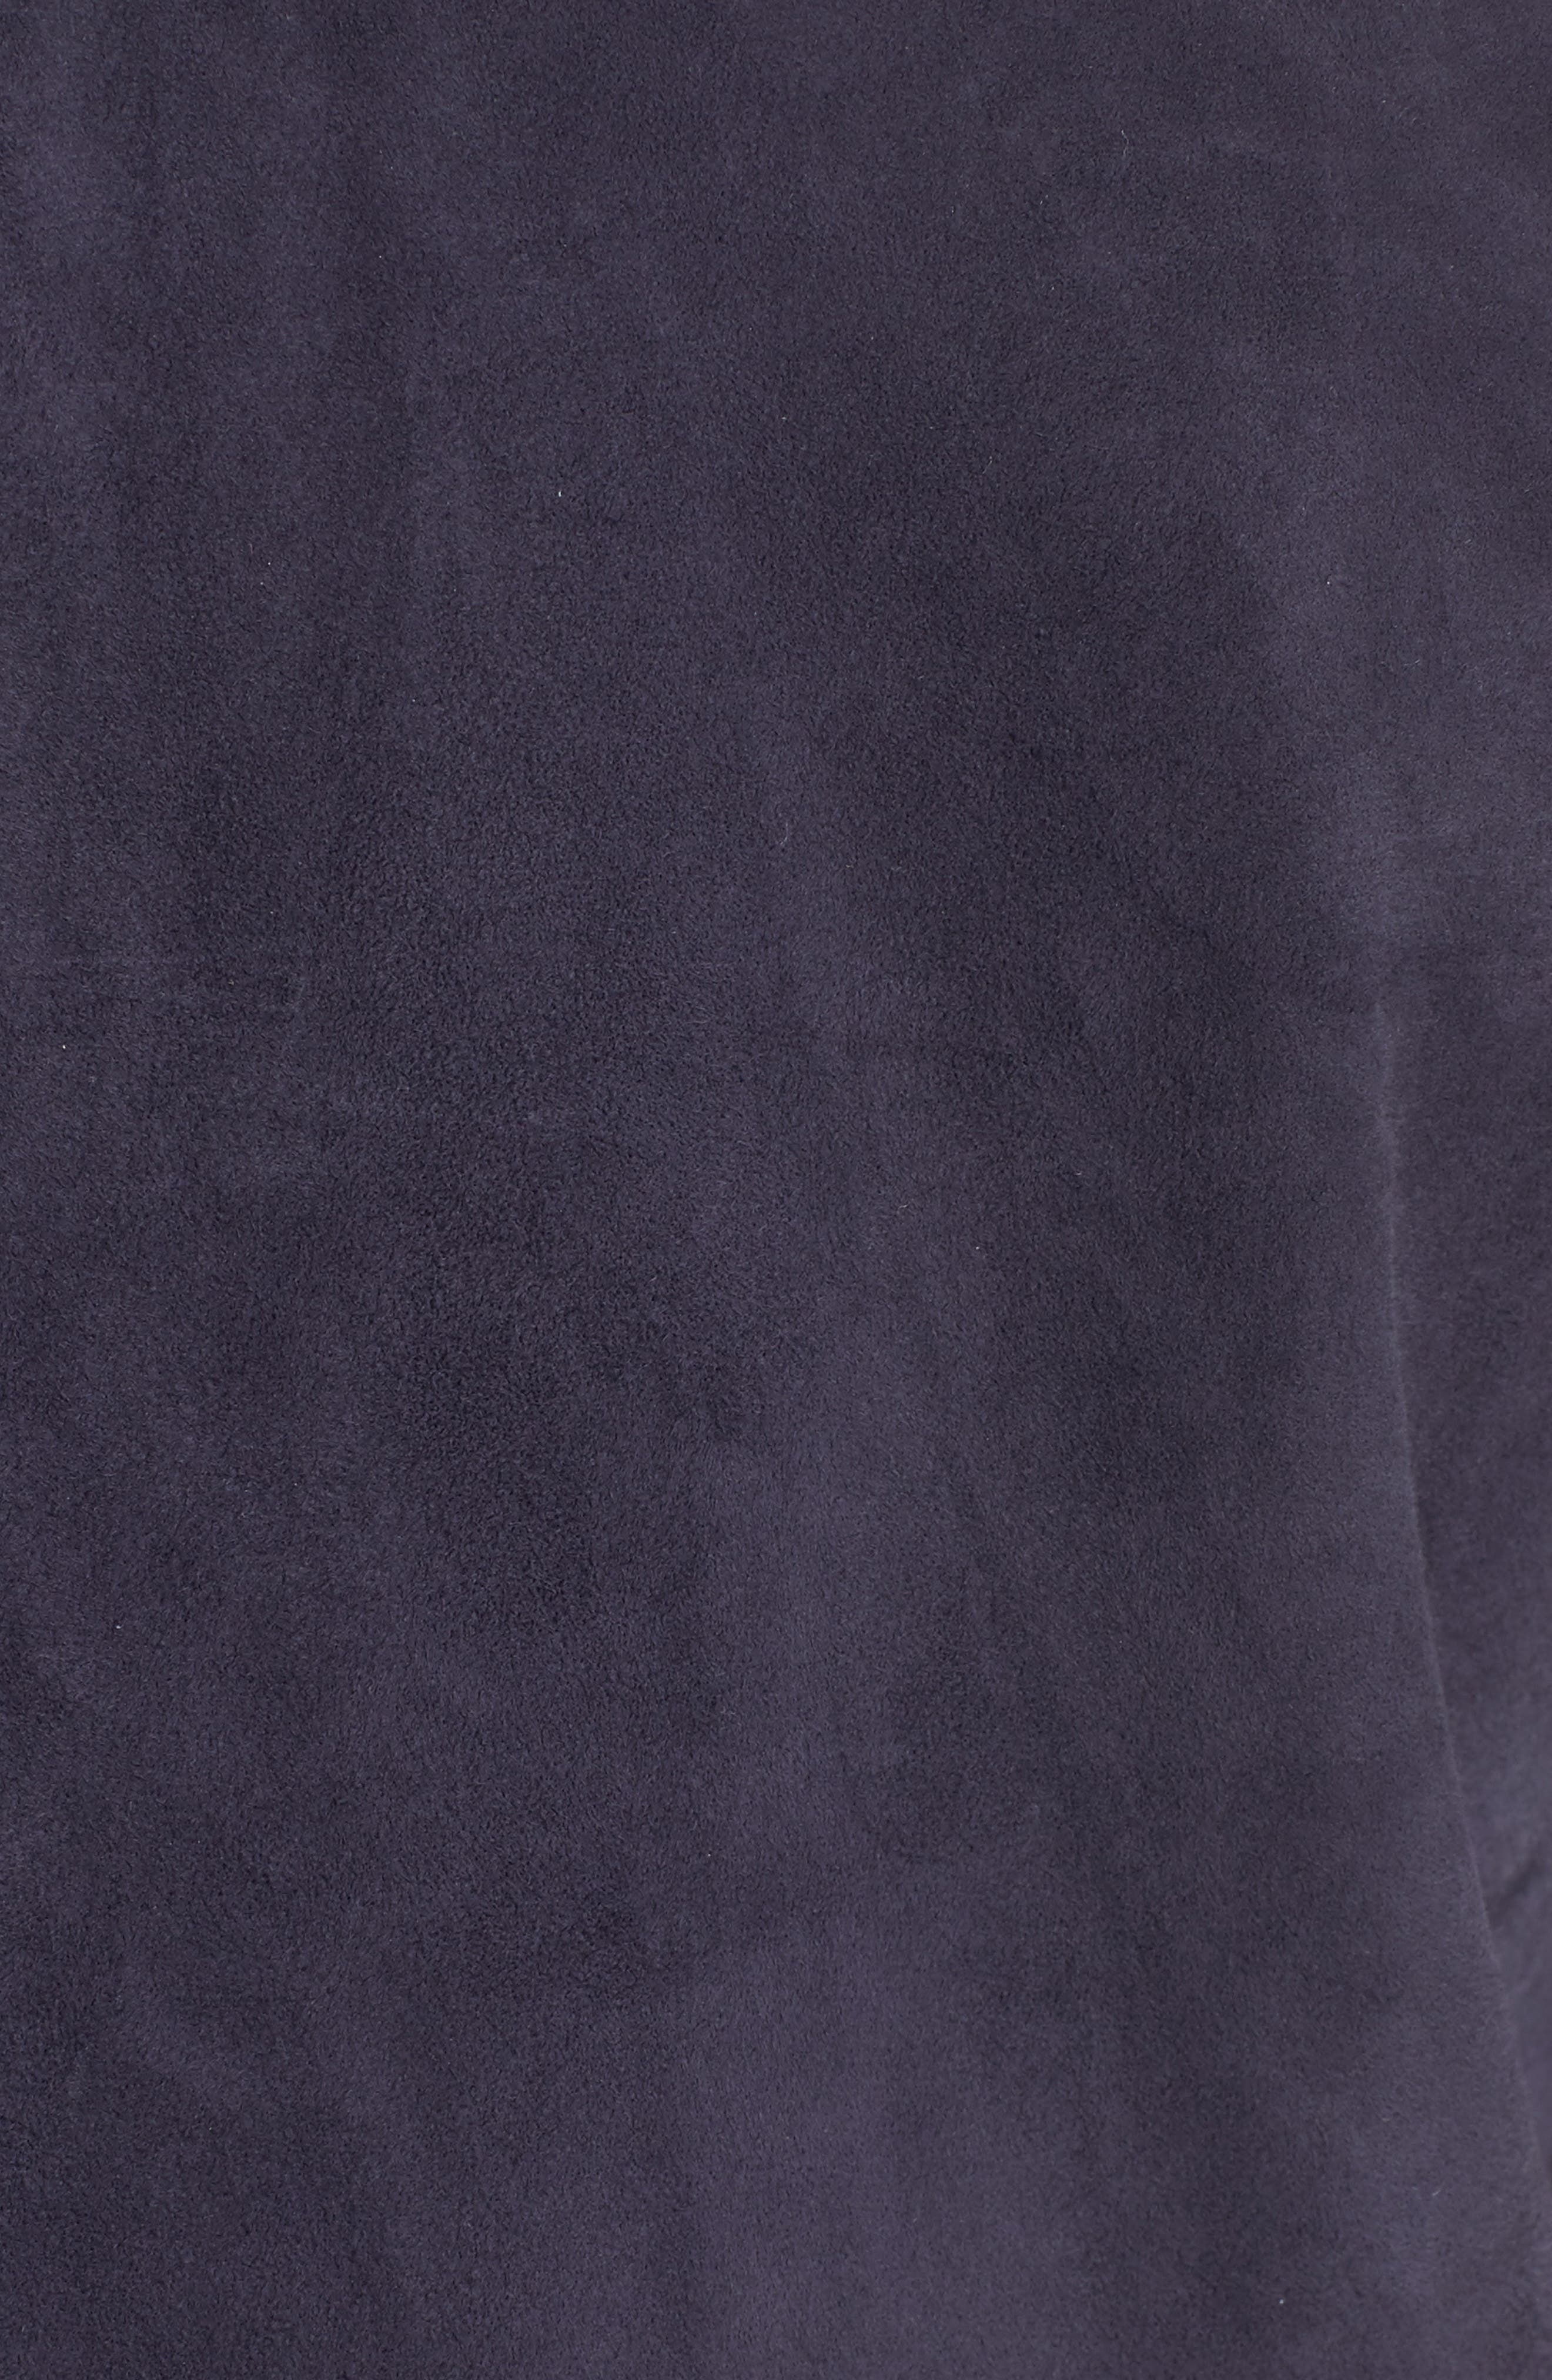 Suede Jacket,                             Alternate thumbnail 5, color,                             Royal Blue